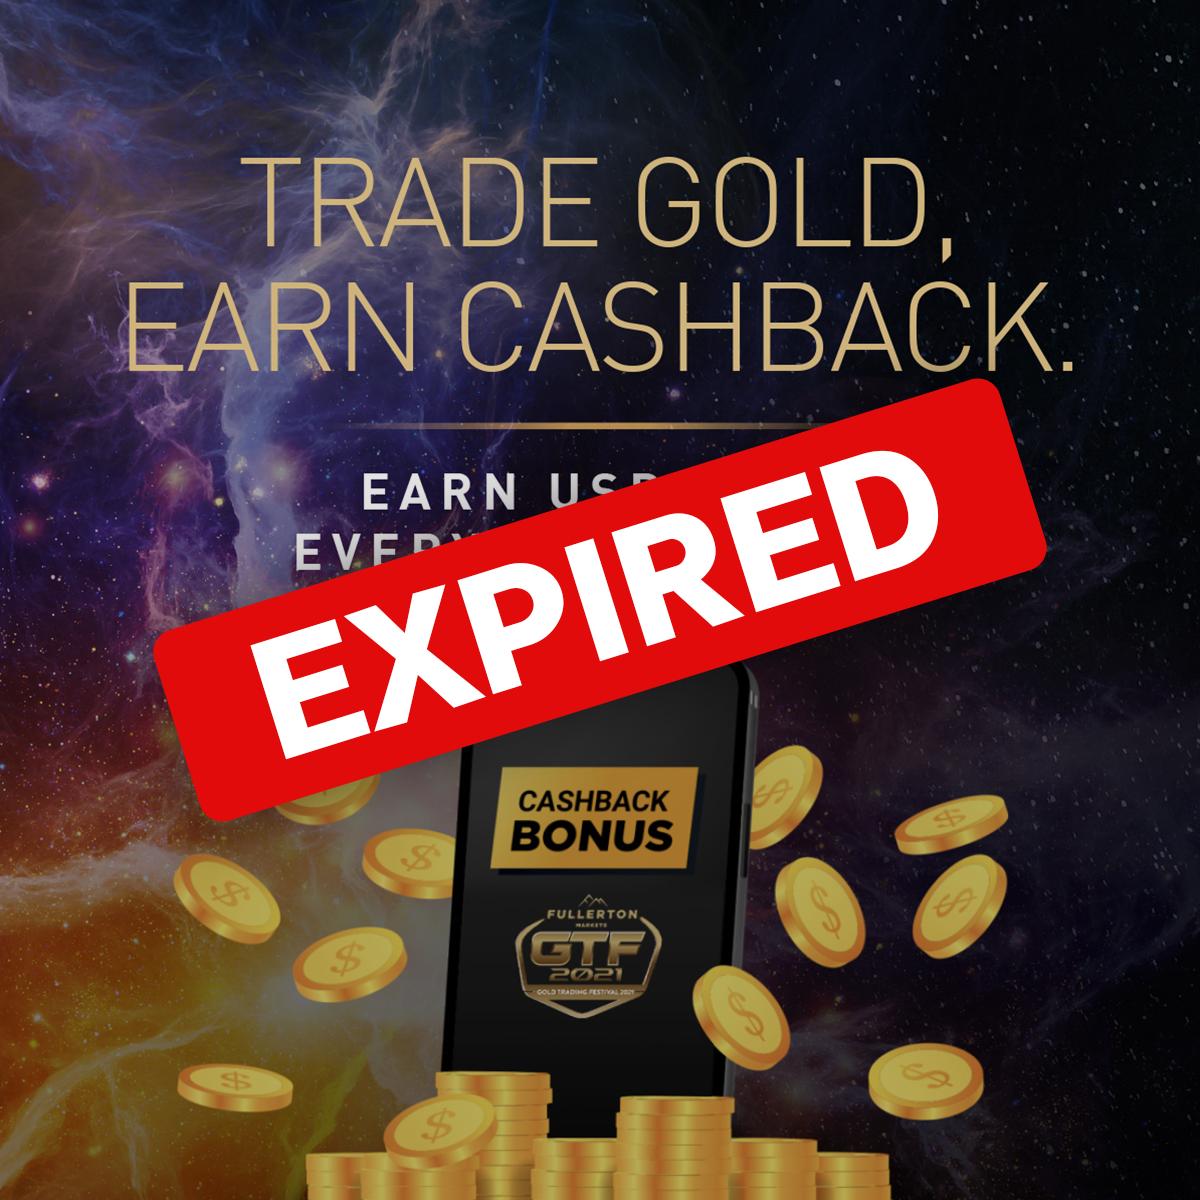 GTF---Banners-for-Cashback-Bonus_1200x1200px-EN